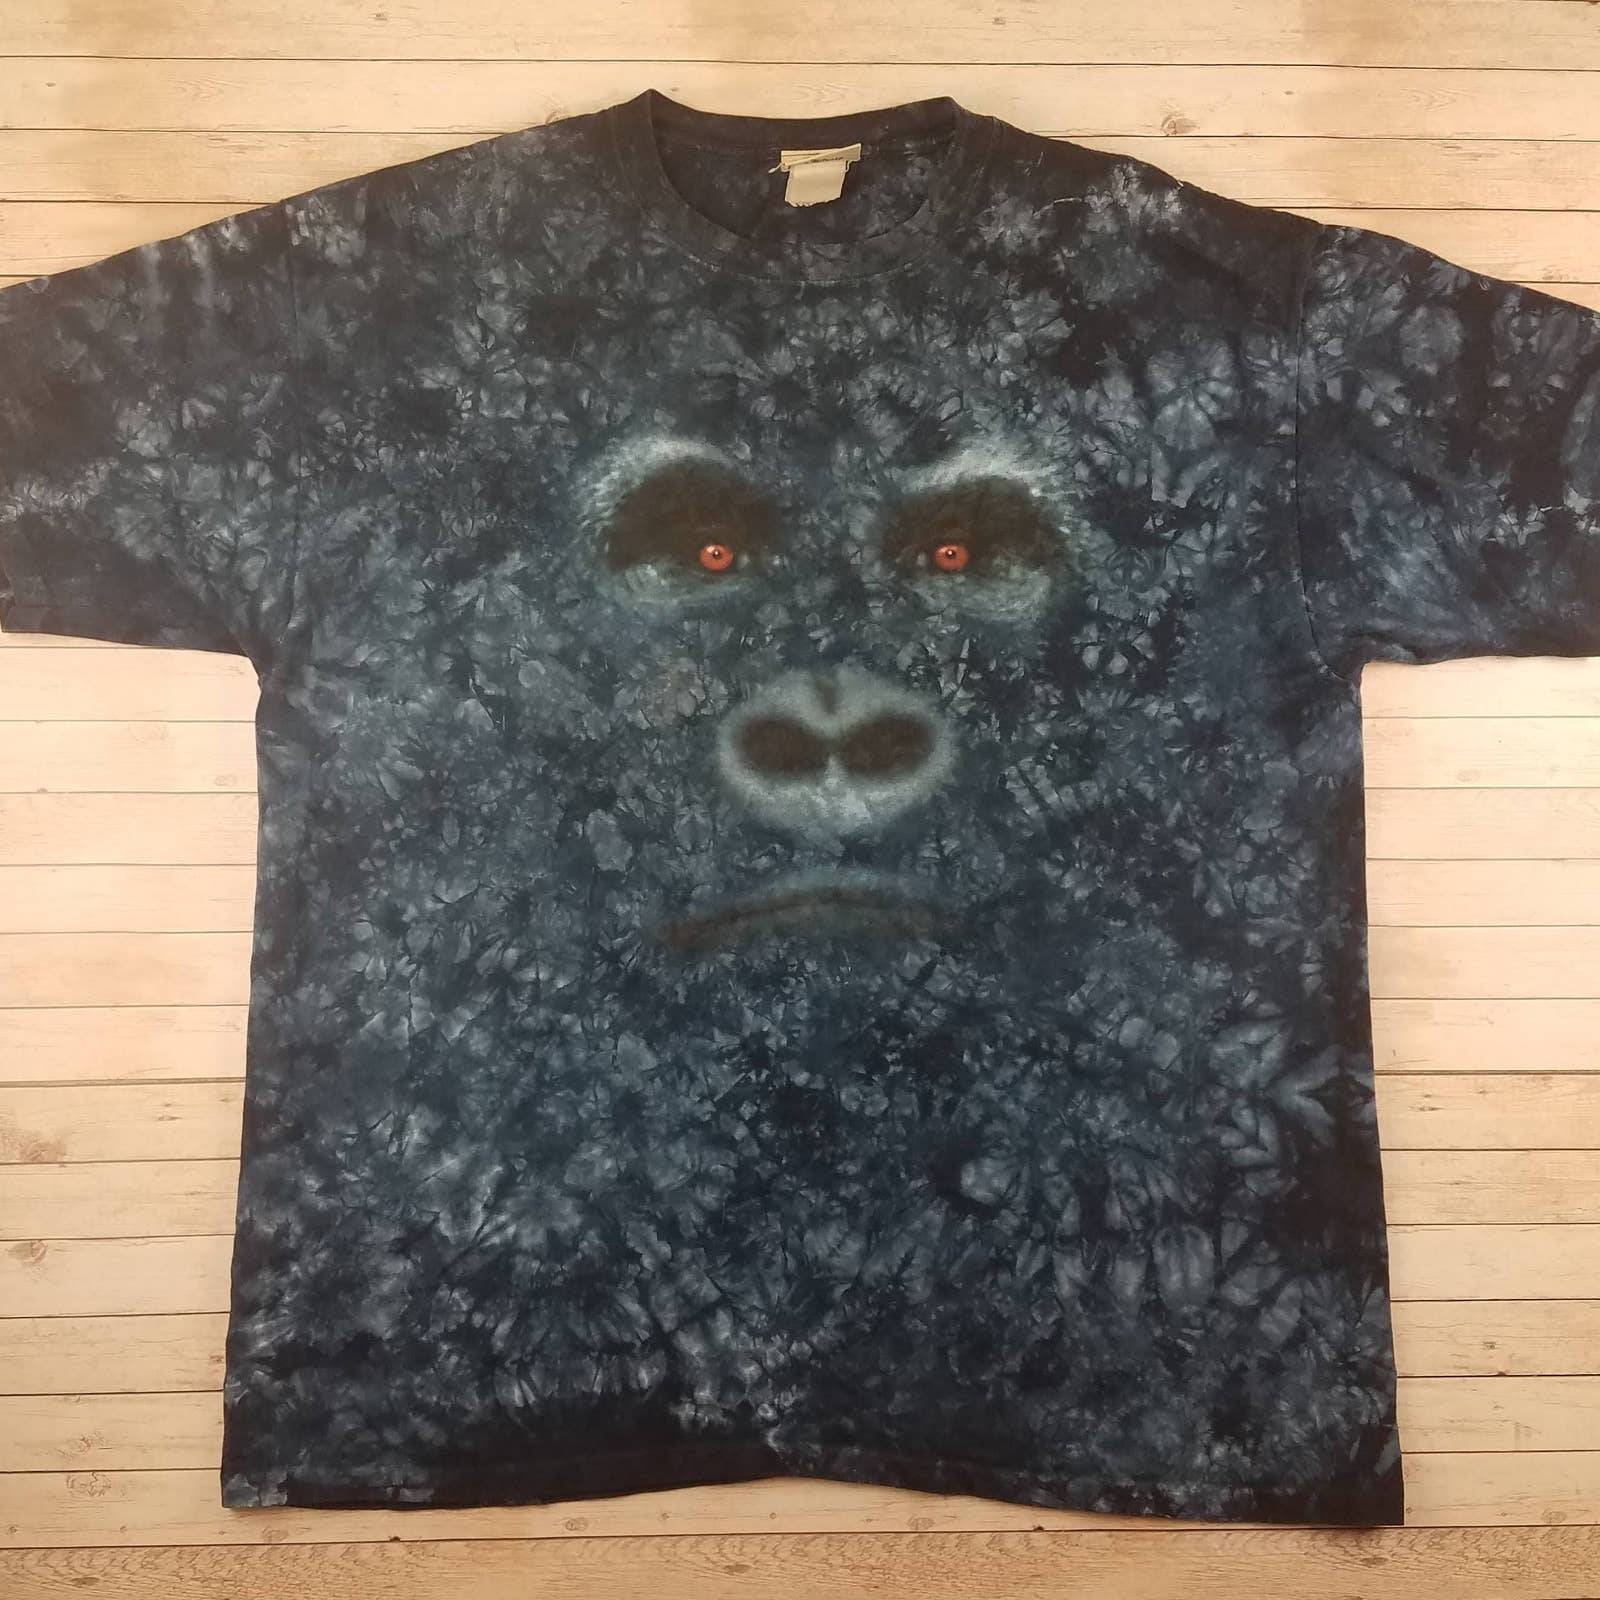 VTG 1990s Gorilla Disney AOP Tee Shirt